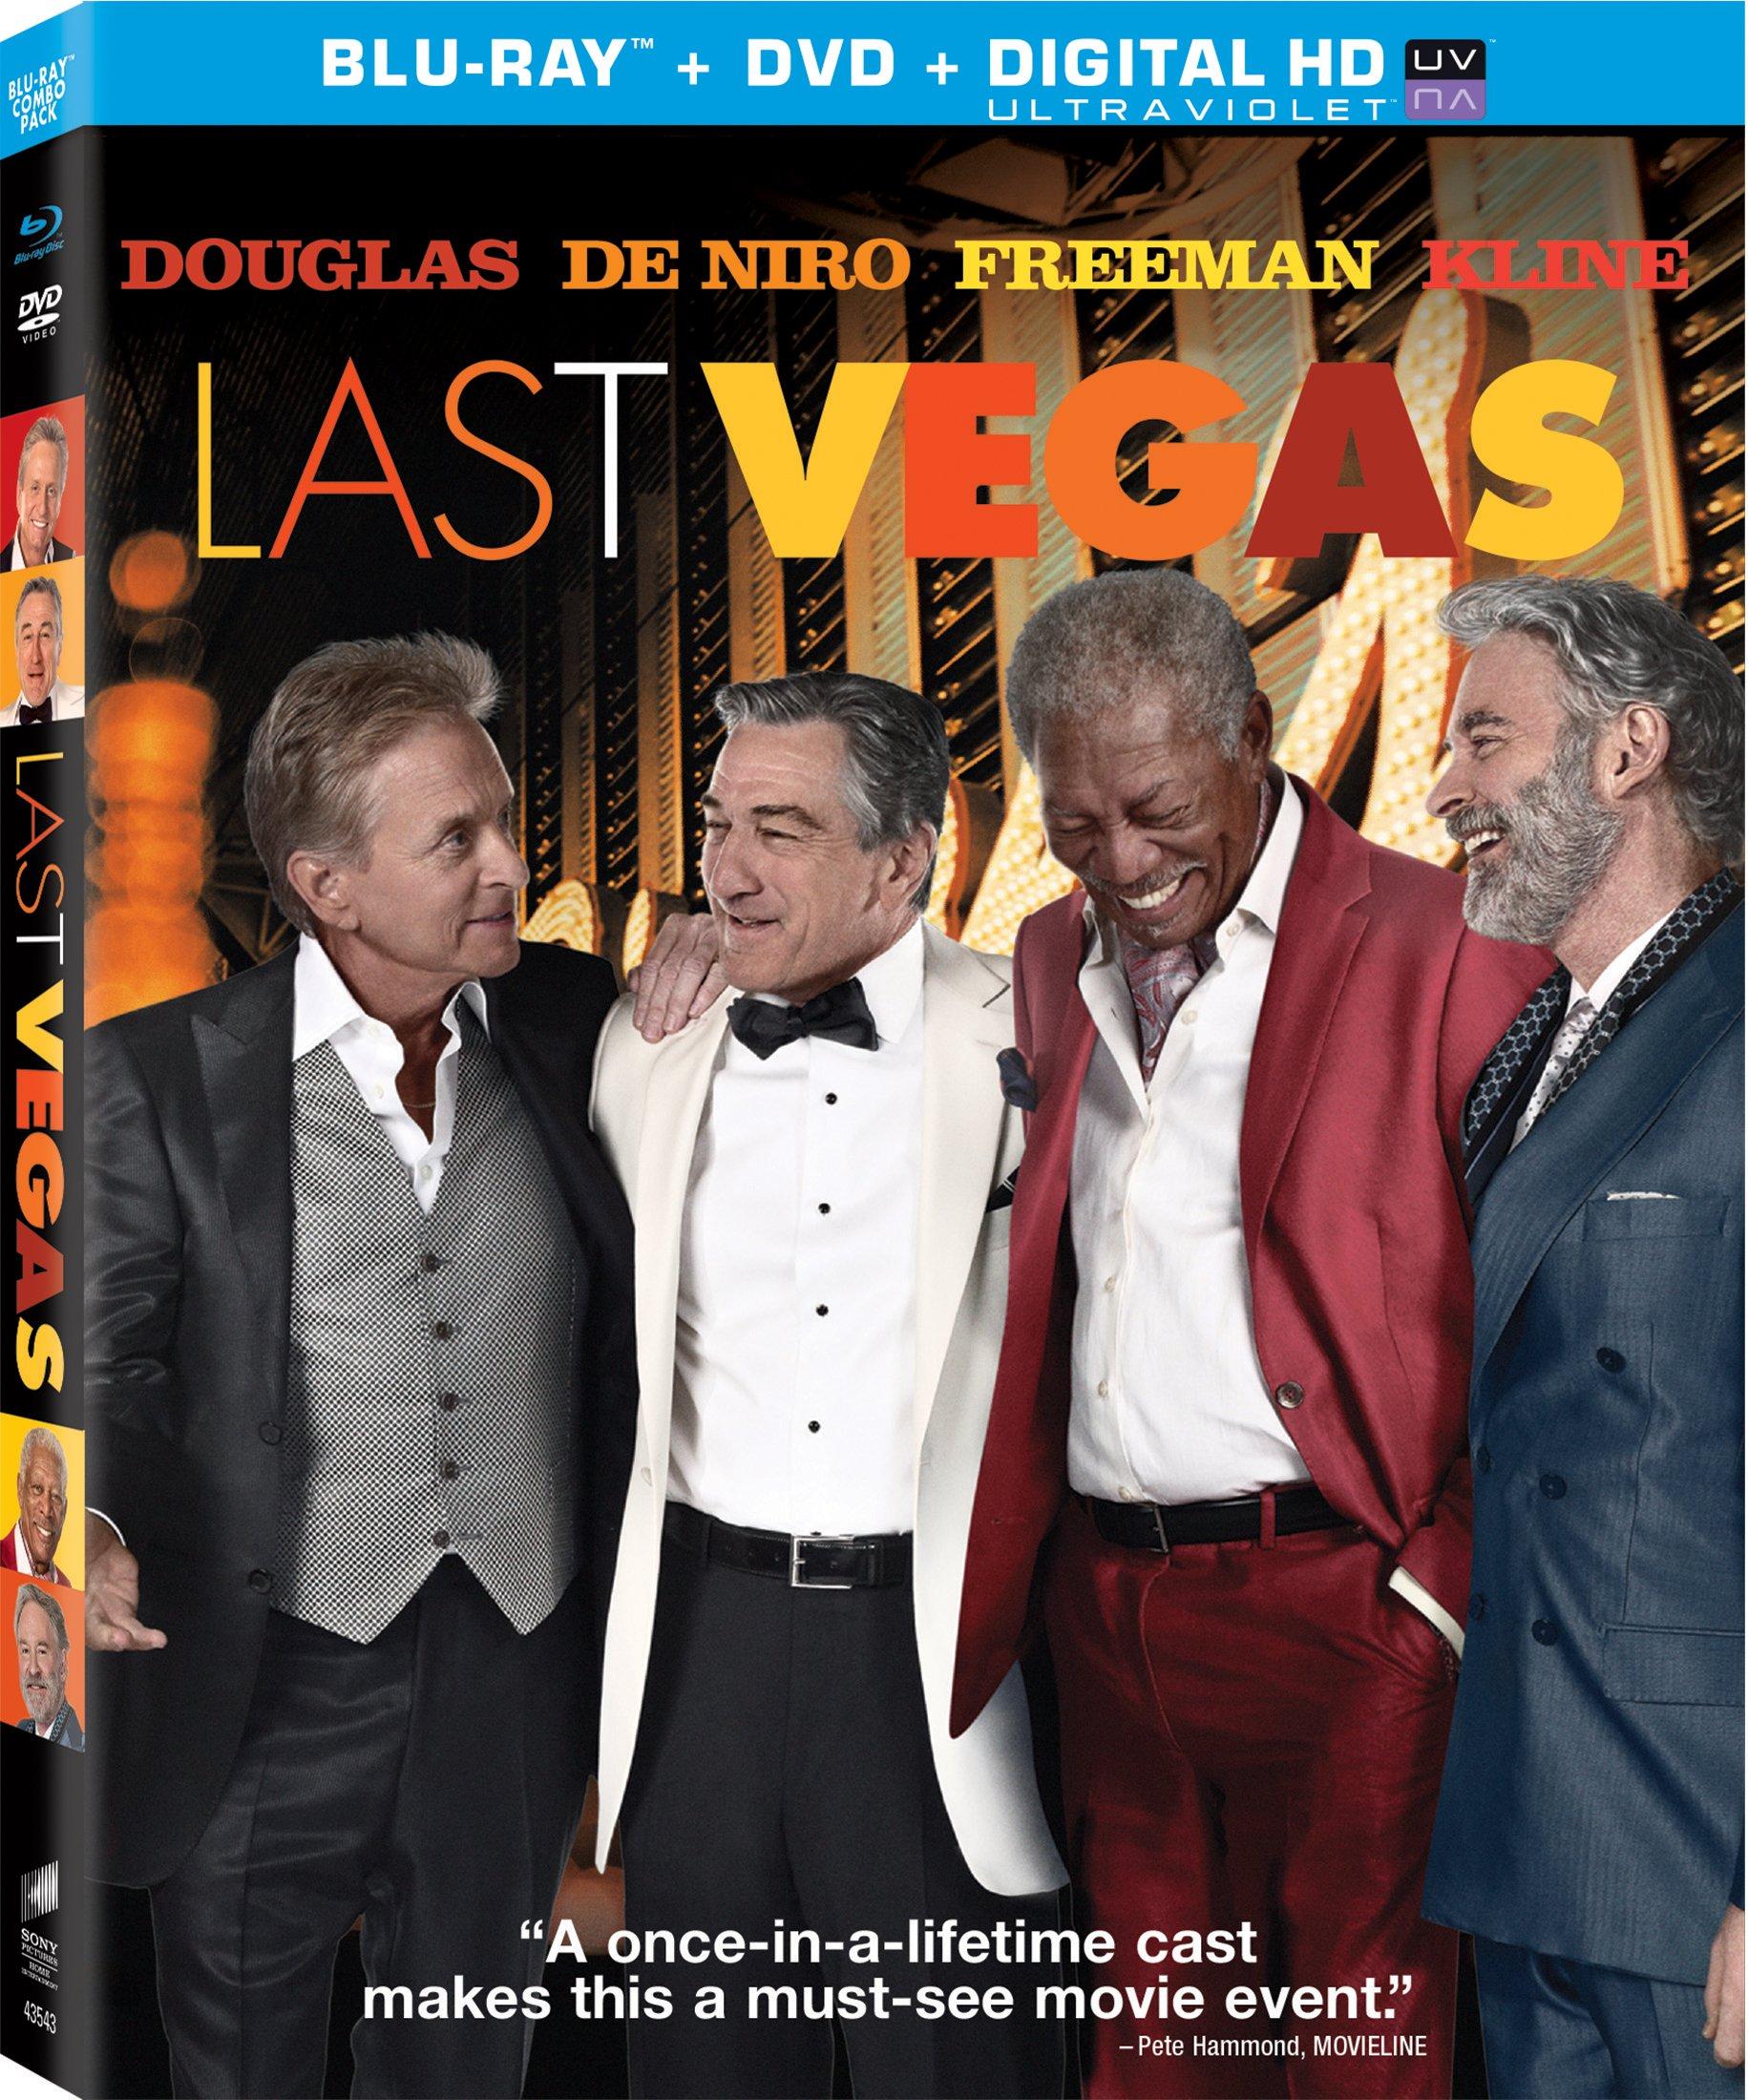 last vegas cover - photo #11